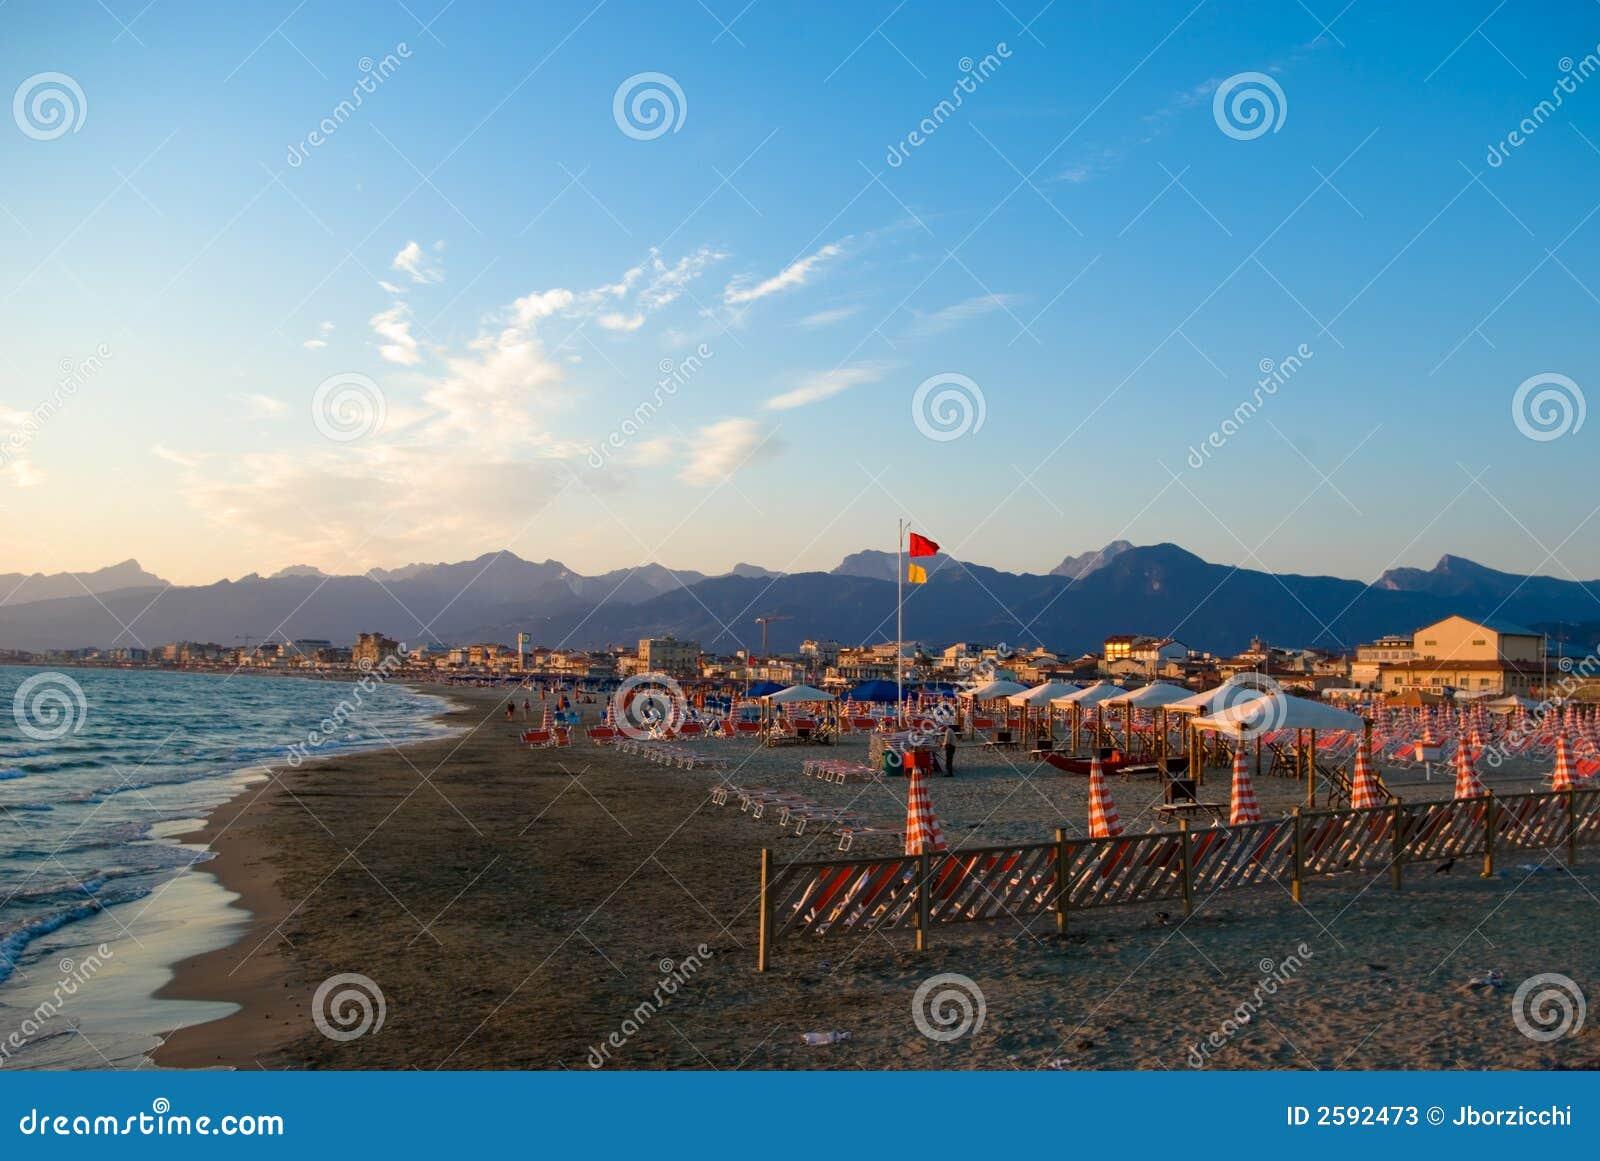 Viareggio s sandy beach,